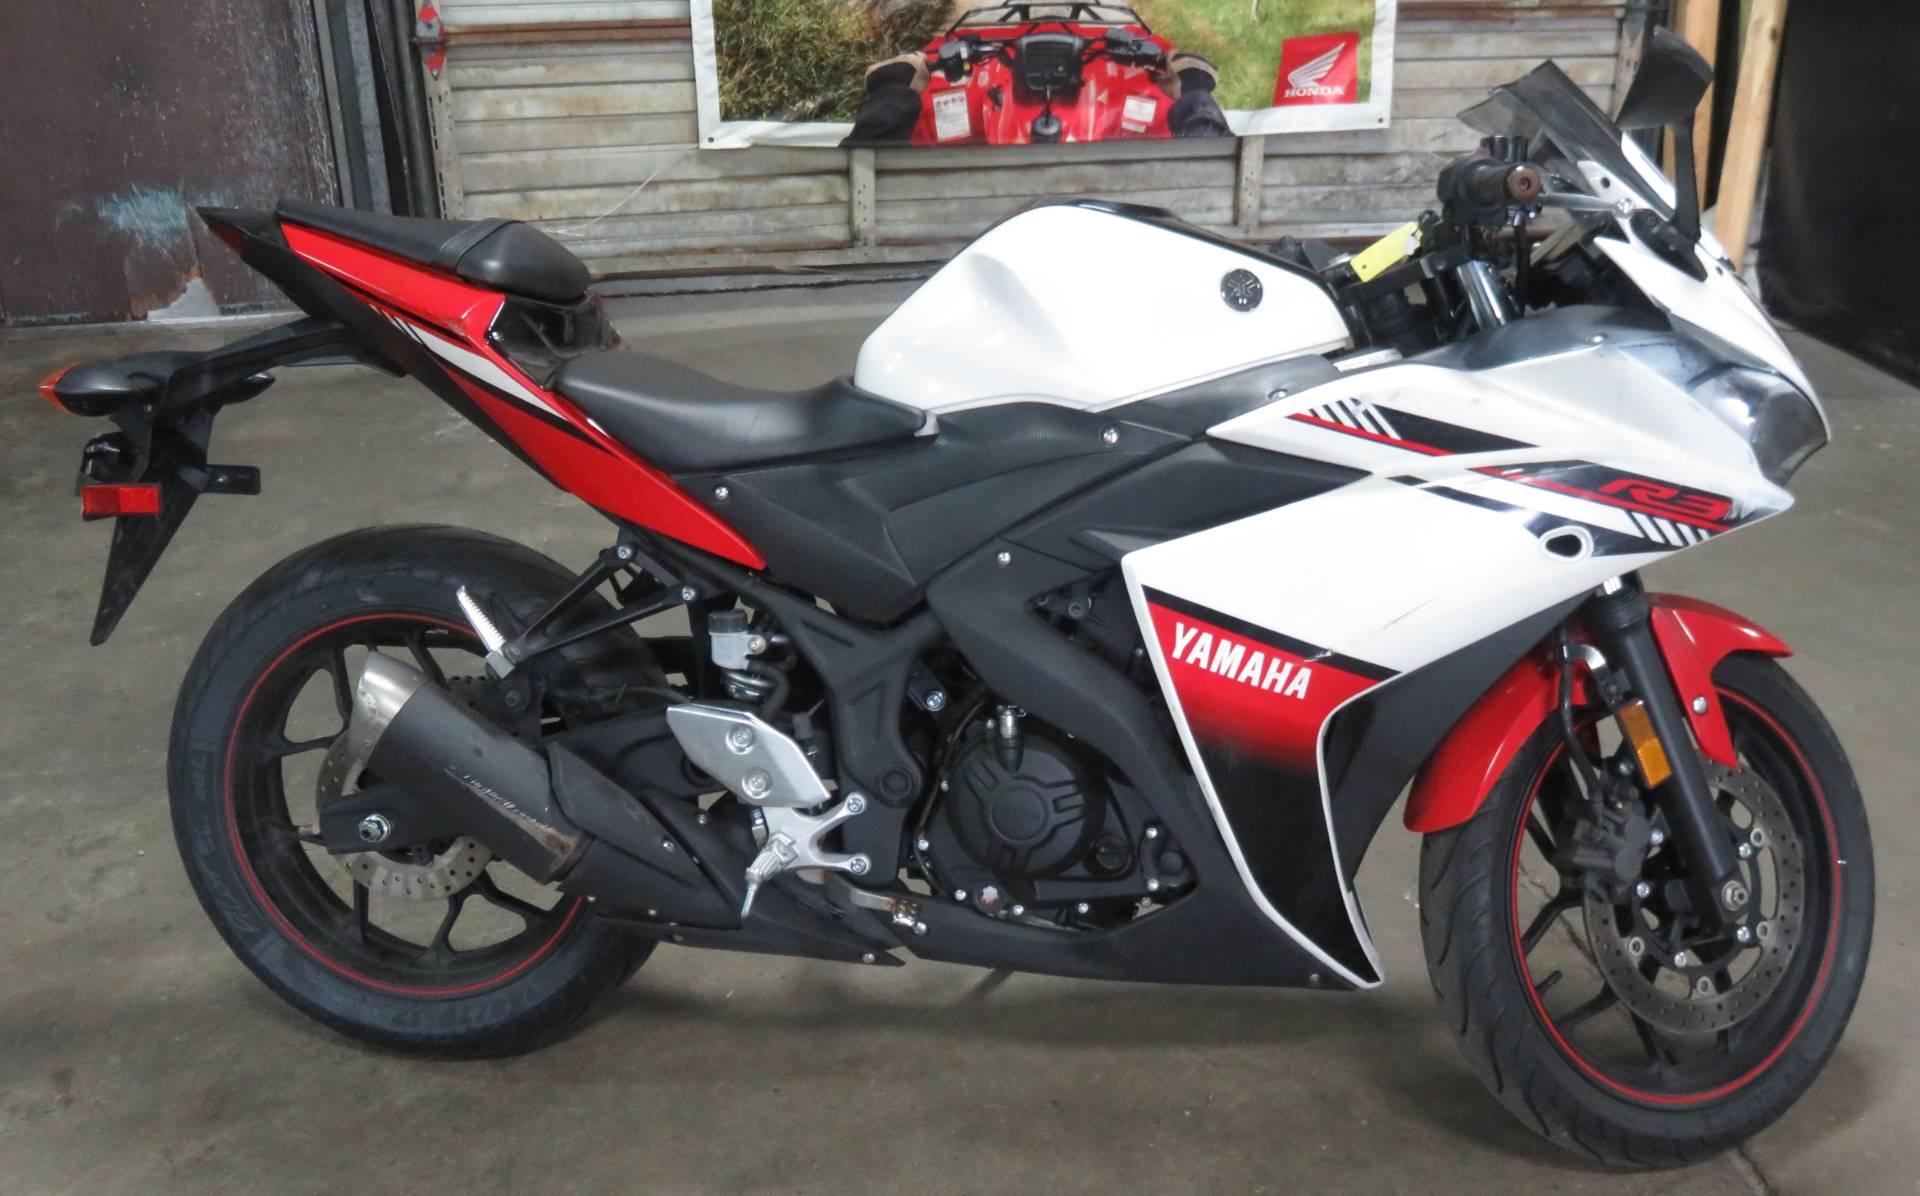 2016 Yamaha YZF-R3 for sale 86863